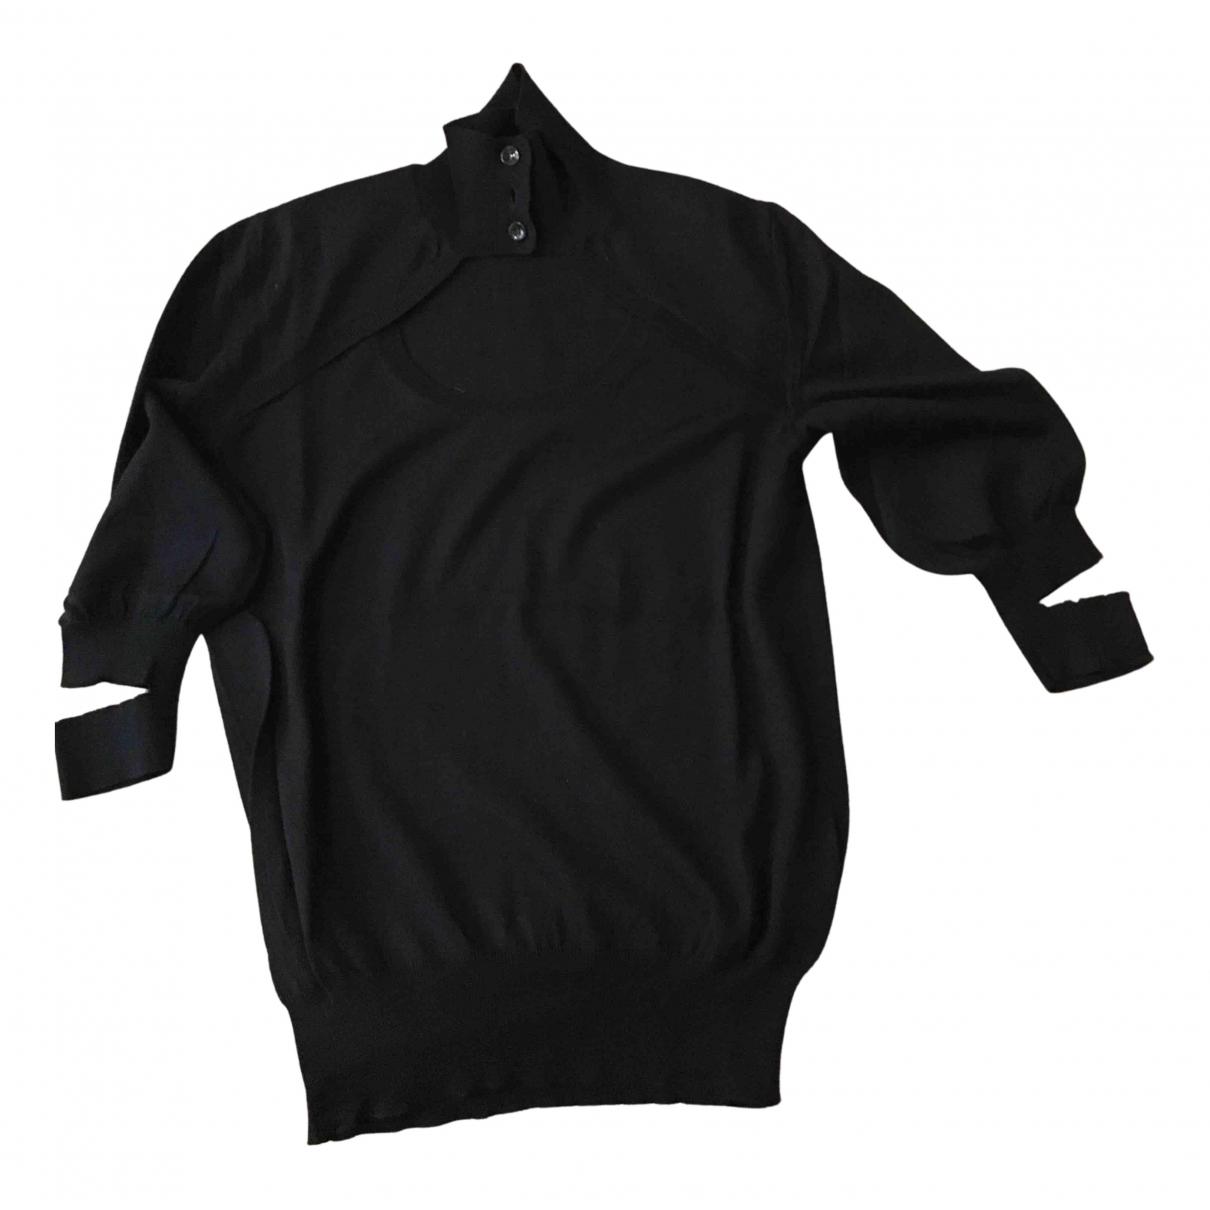 Yves Saint Laurent N Black Wool Knitwear for Women M International